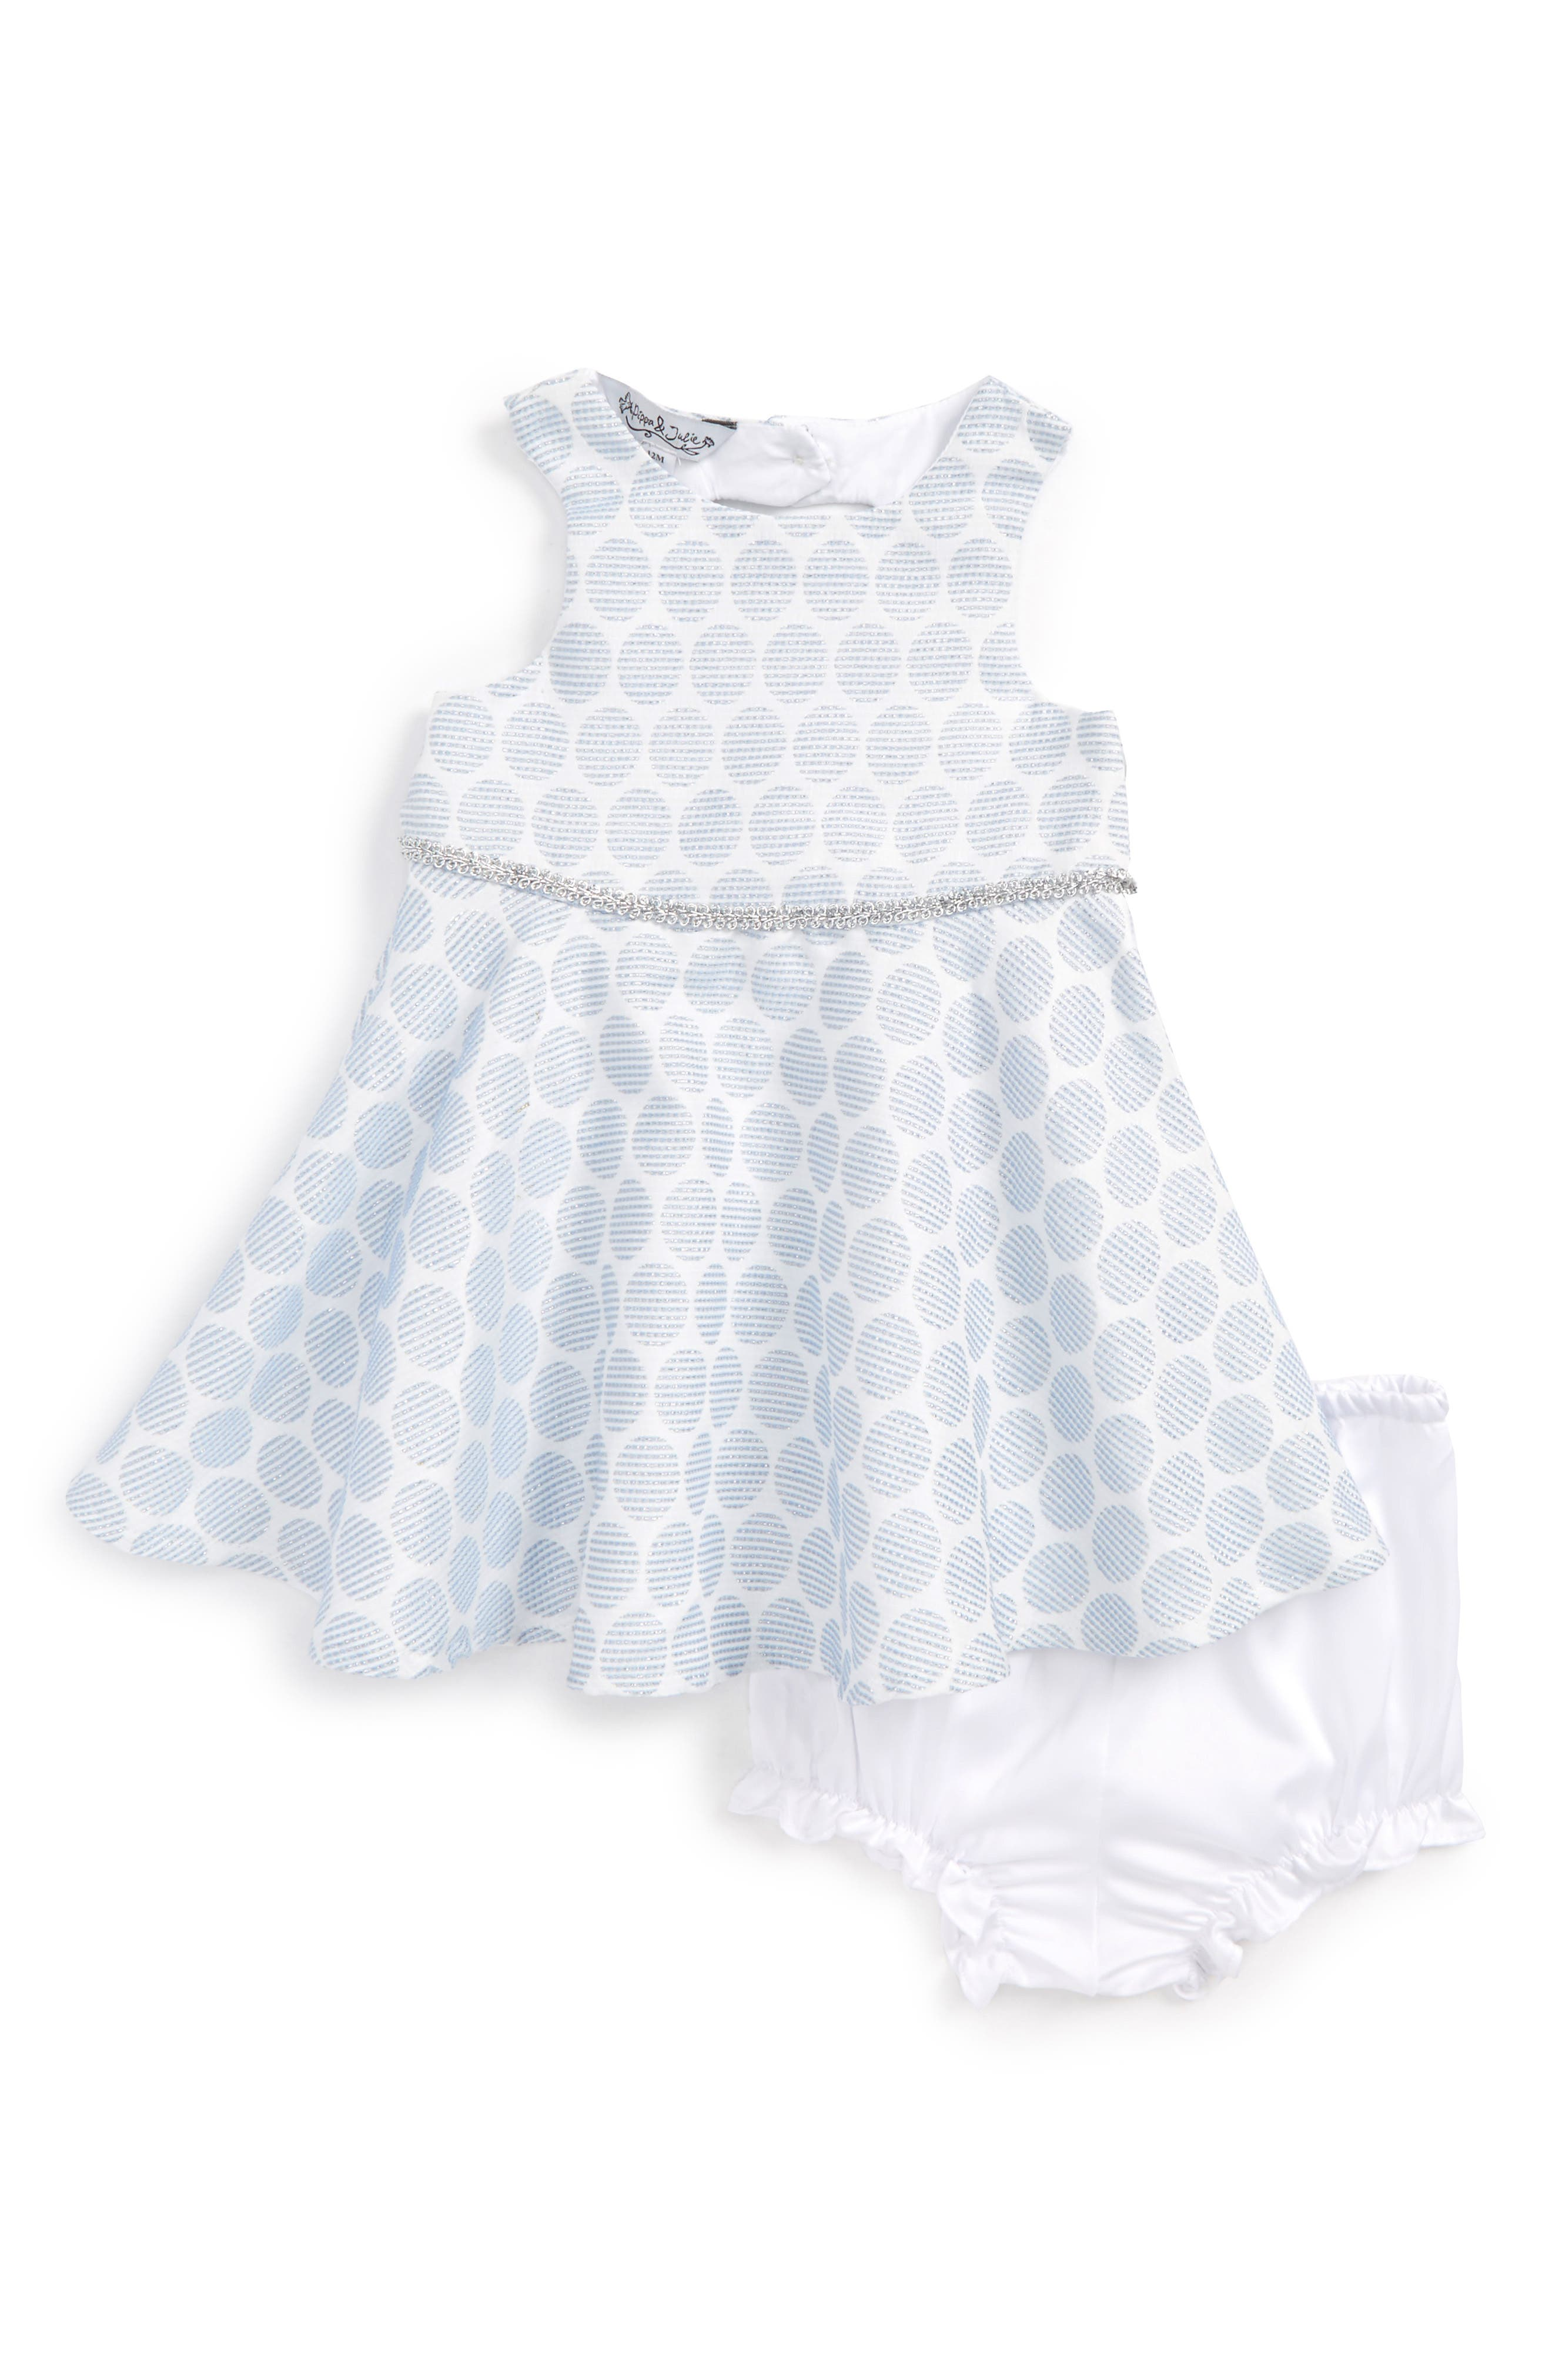 Polka Dot Dress,                             Main thumbnail 1, color,                             Light Blue/ White